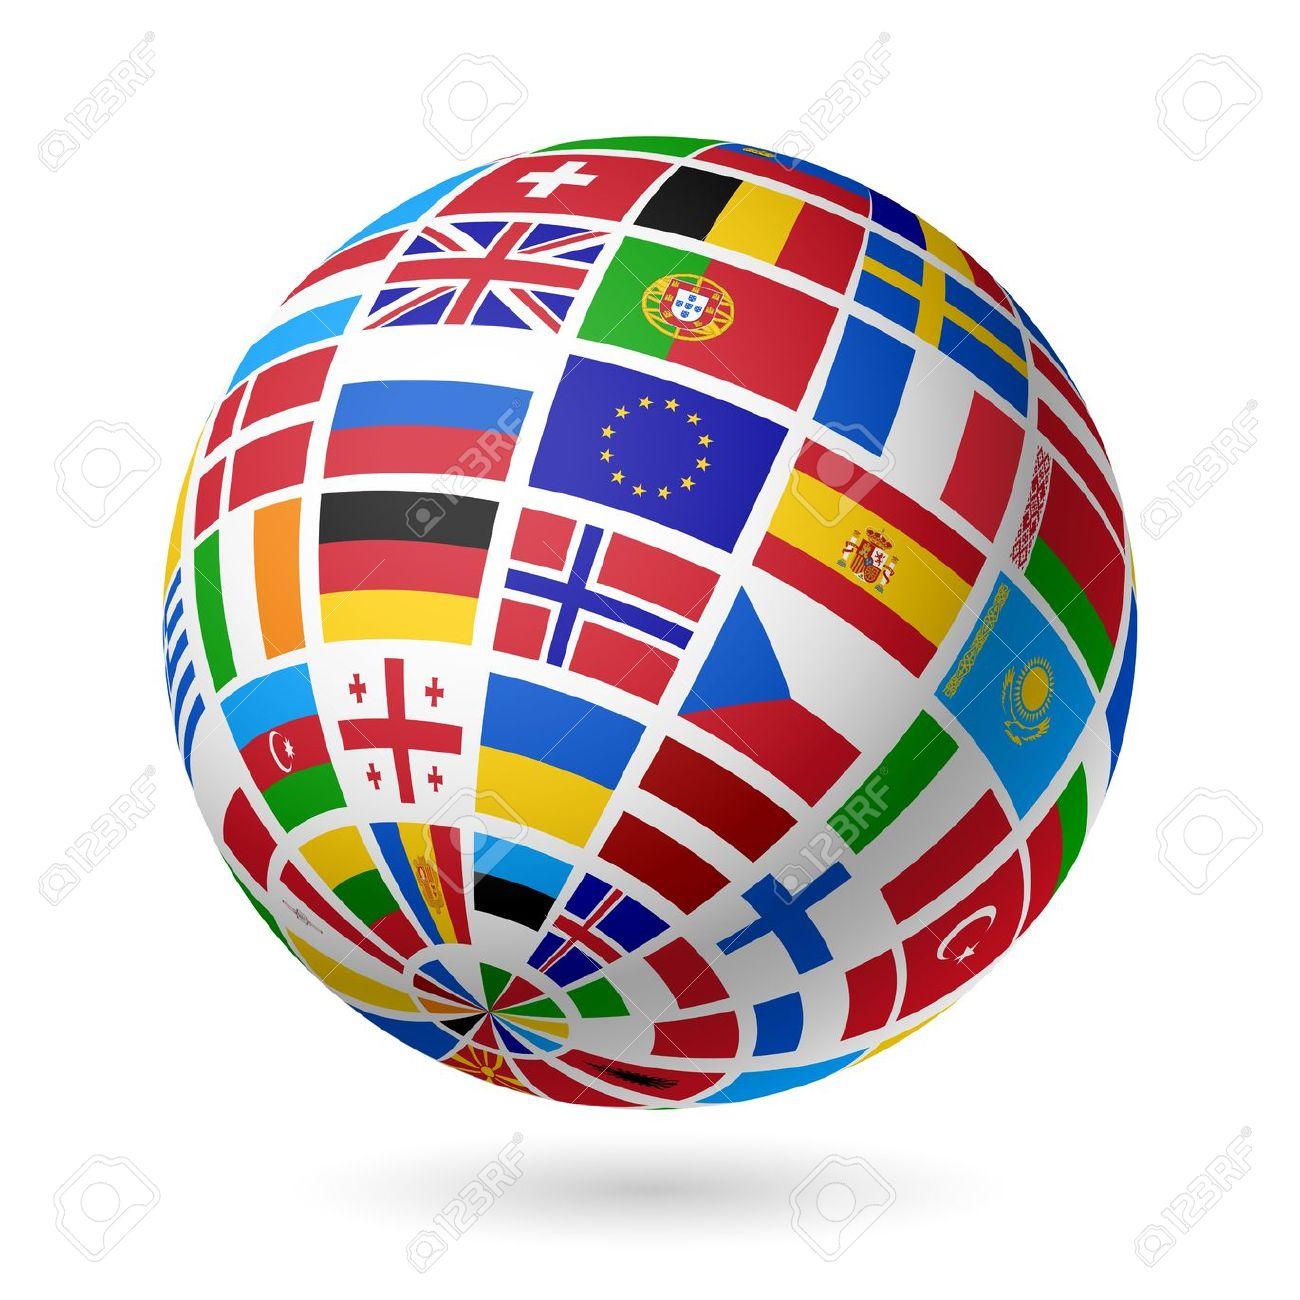 Flags globe Europe Stock Vector - 15017439 - Europa Vector Flag PNG